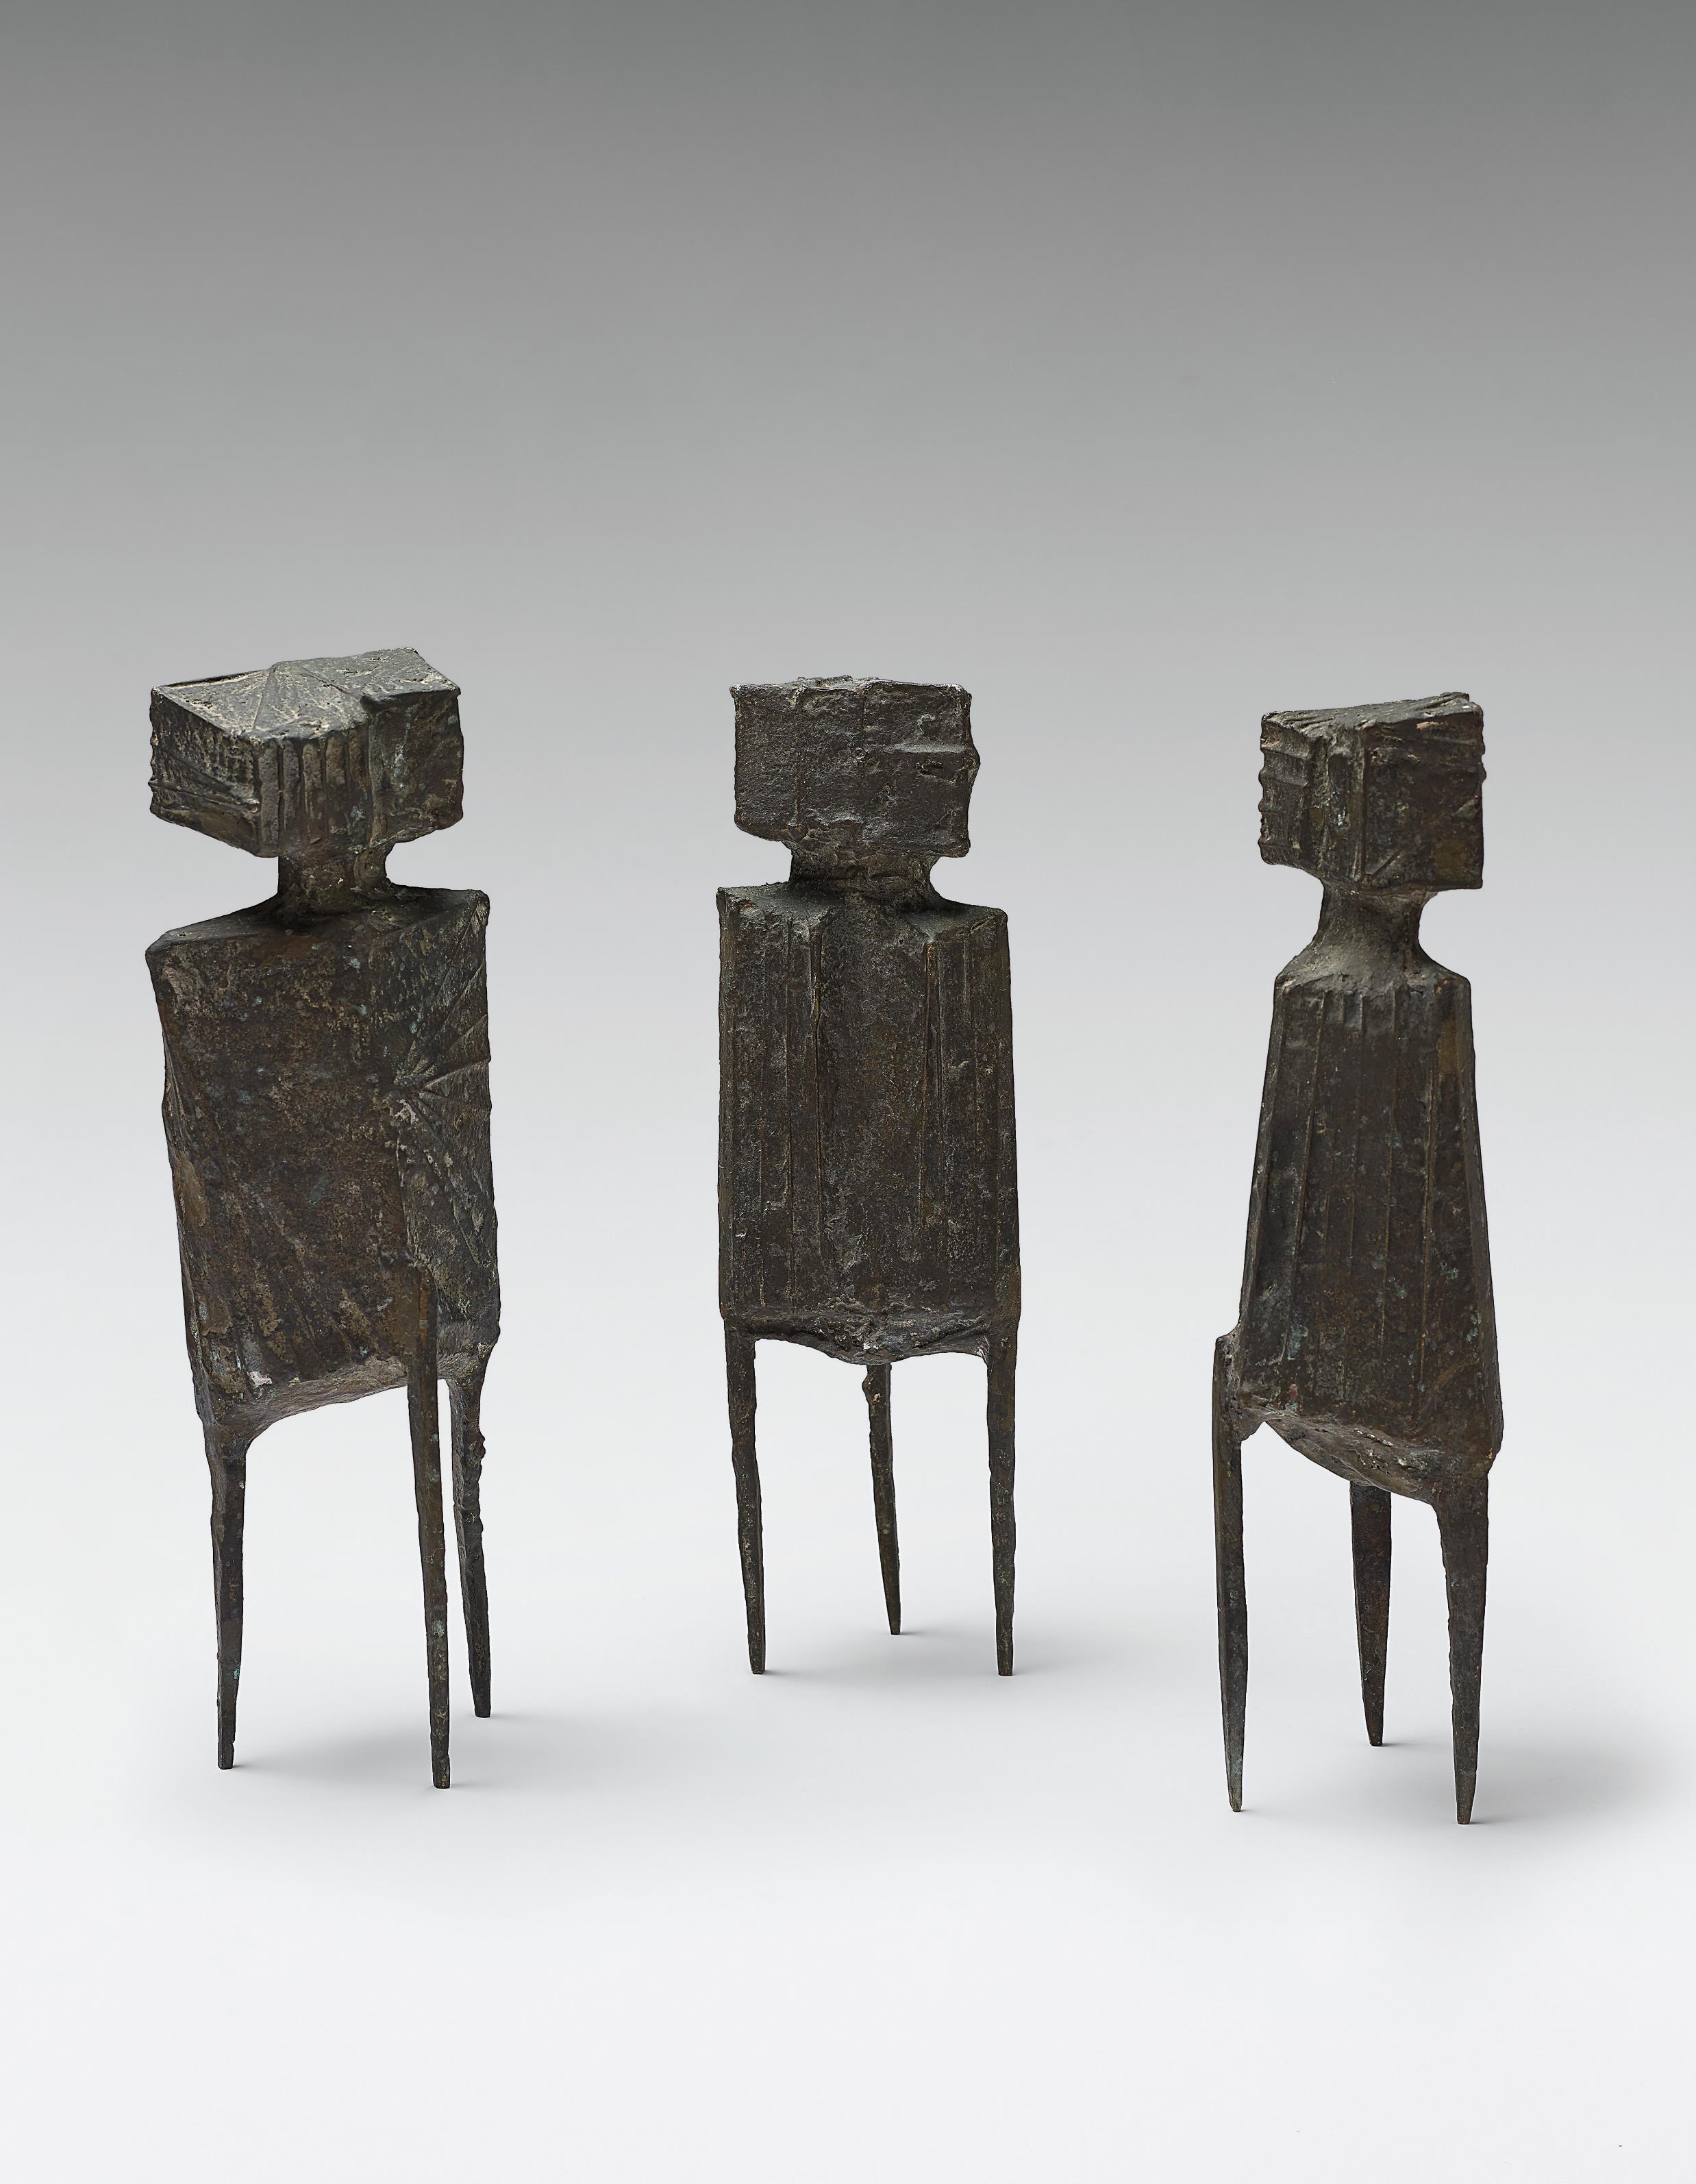 Lynn Chadwick-Maquette For Watchers Version II-1964